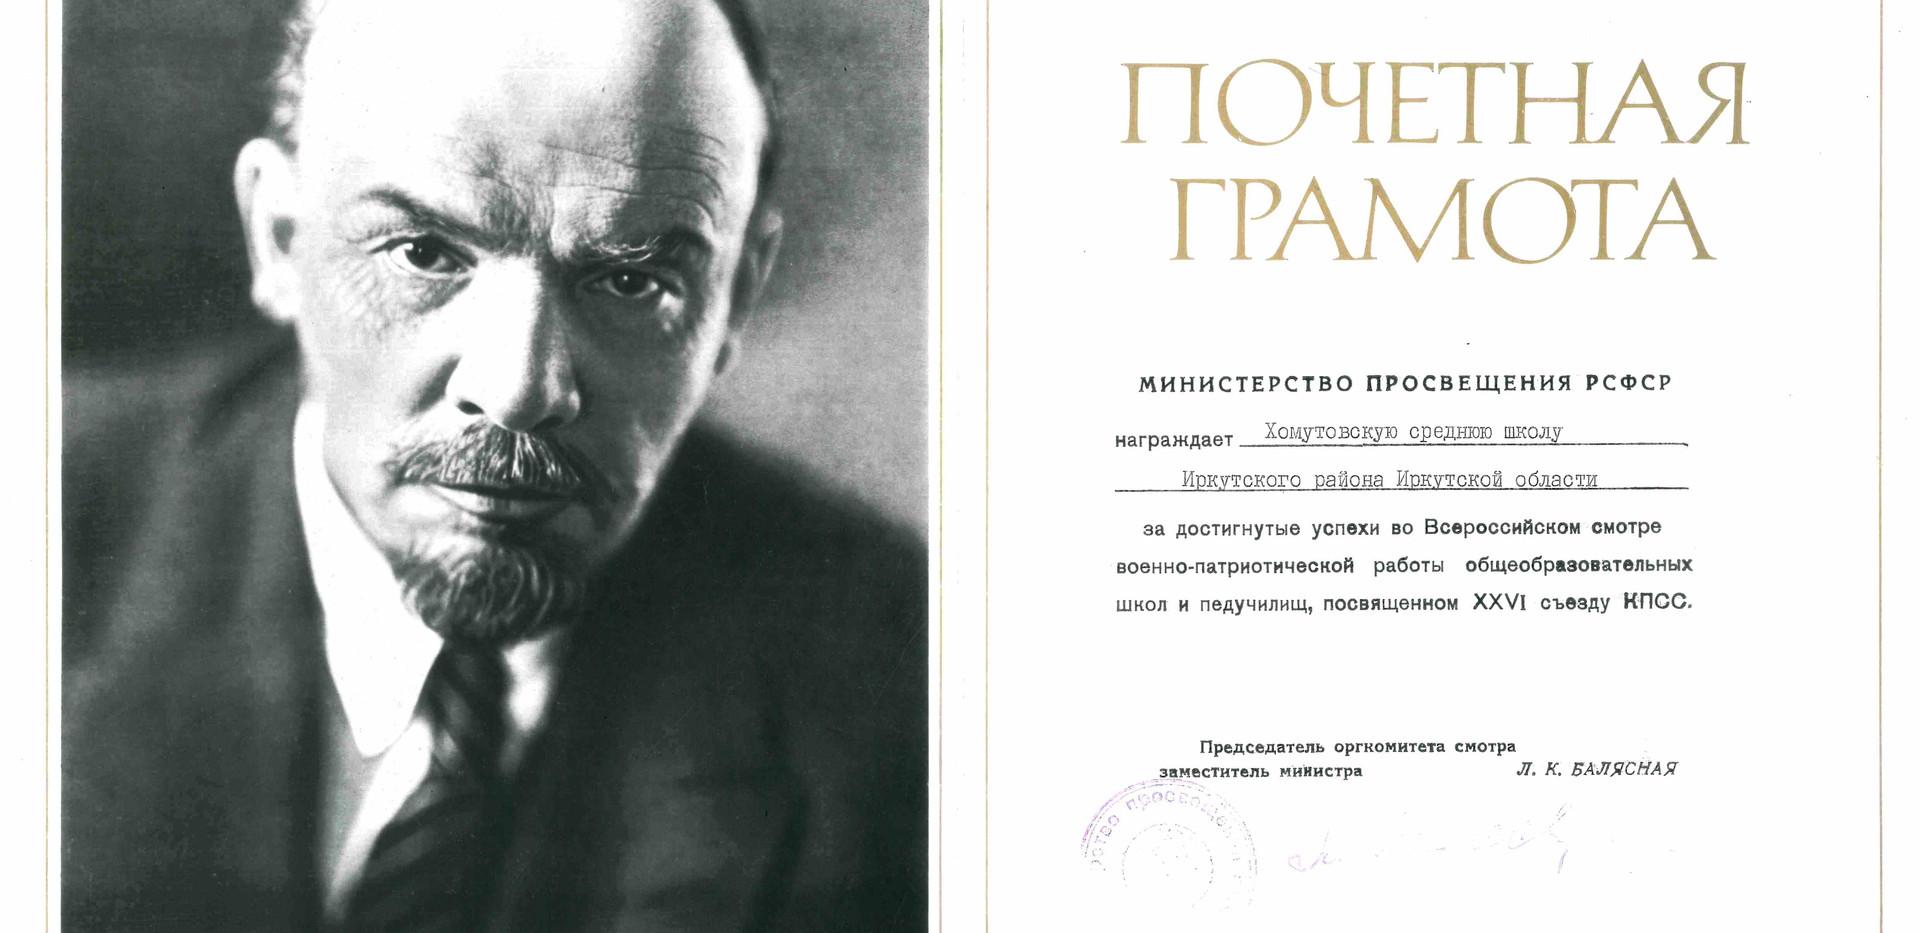 Награды история (8).jpg